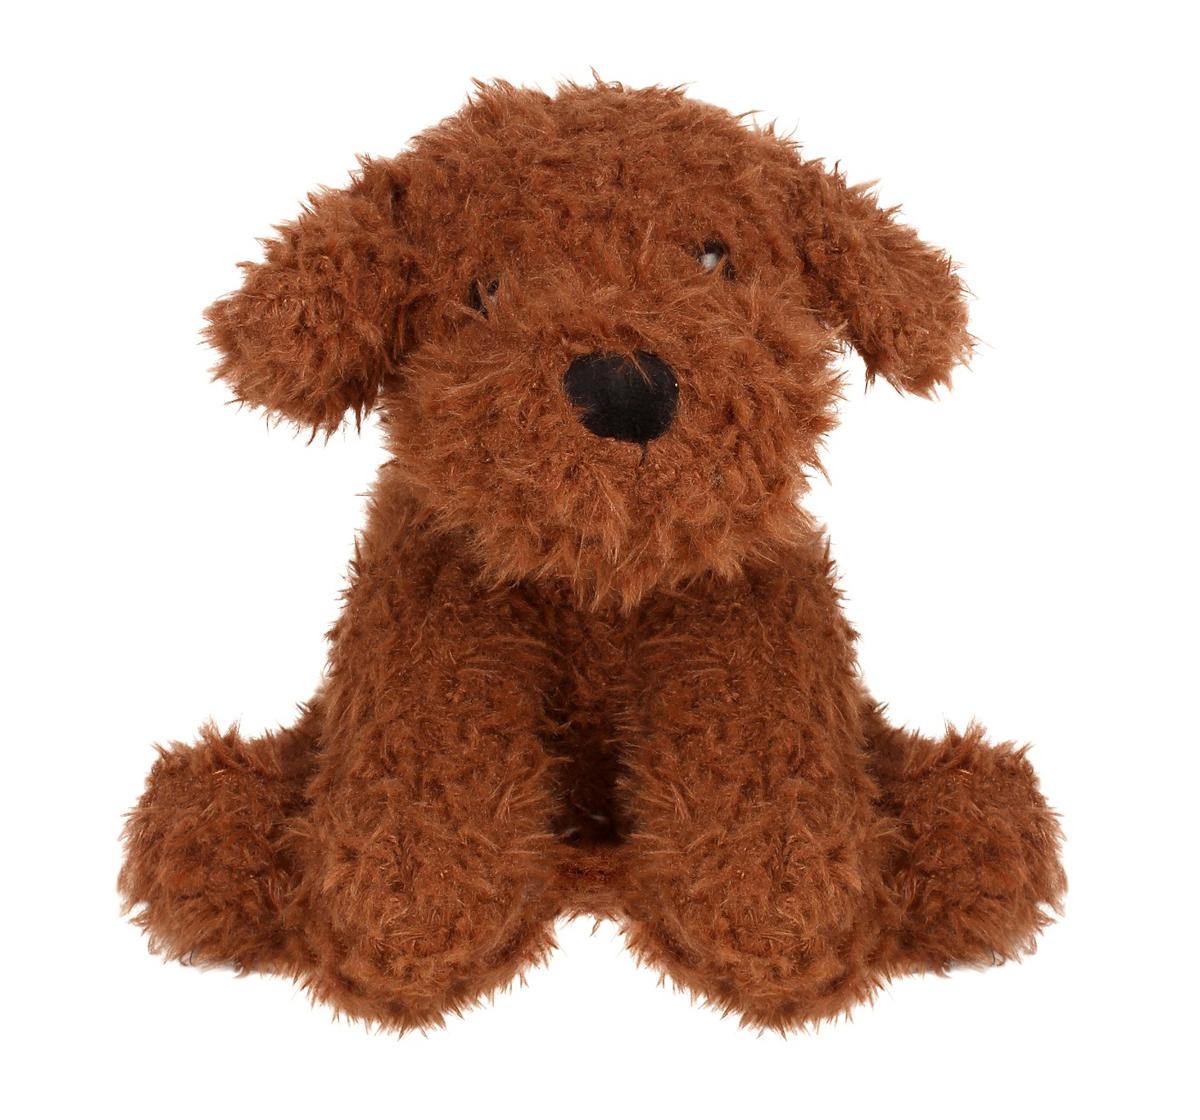 Fuzzbuzz | Fuzzbuzz Sitting Dog - Dark Brown - 25Cm Quirky Soft Toys for Kids age 0M+ - 25 Cm (Dark Brown)